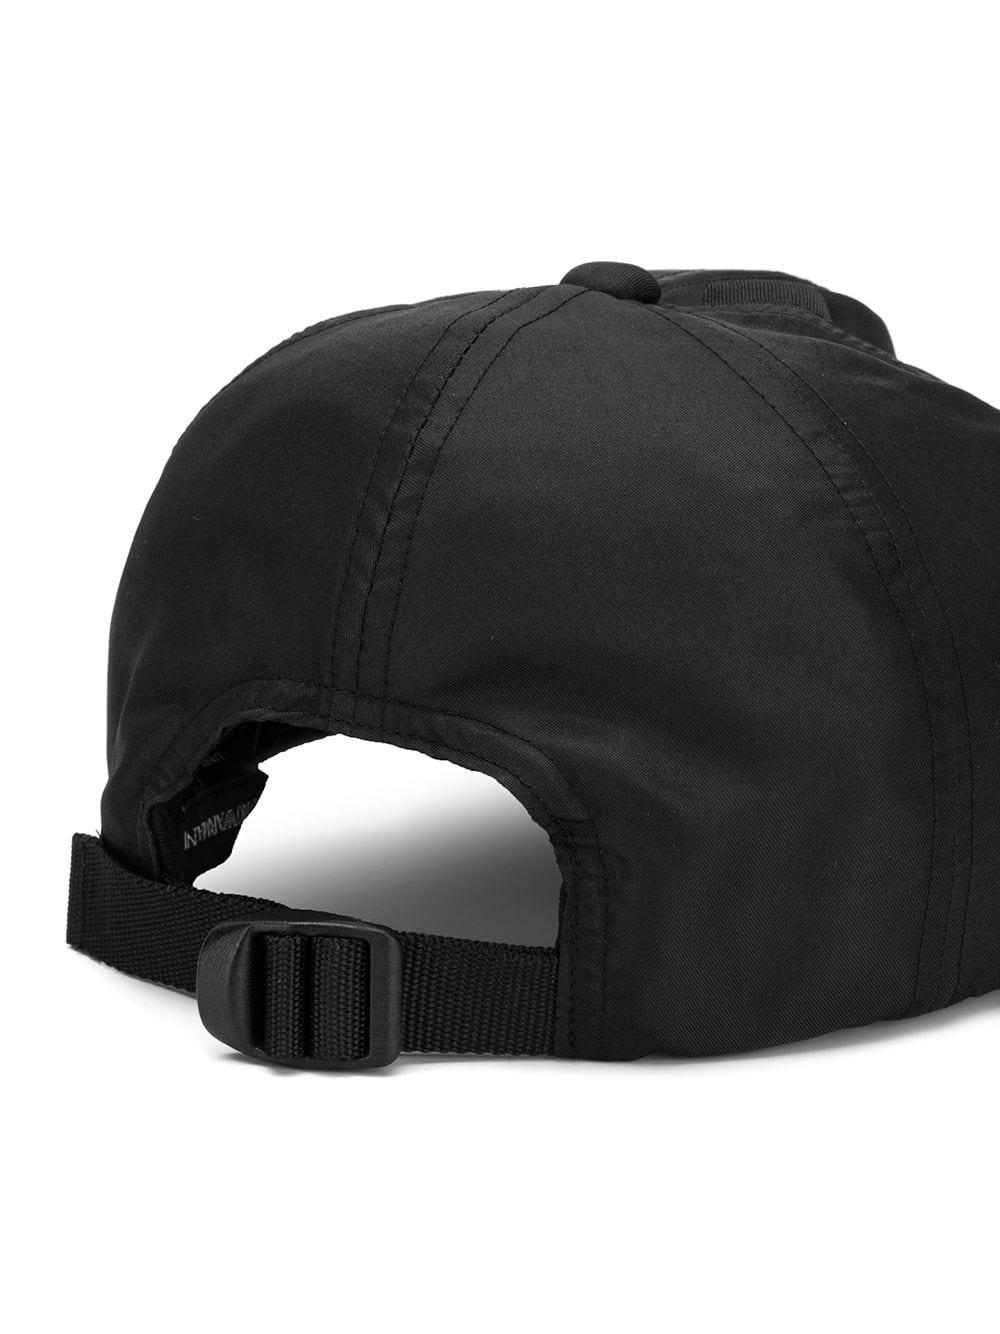 662e5b2eea1 Emporio Armani - Black Maxi Logo Hat for Men - Lyst. View fullscreen